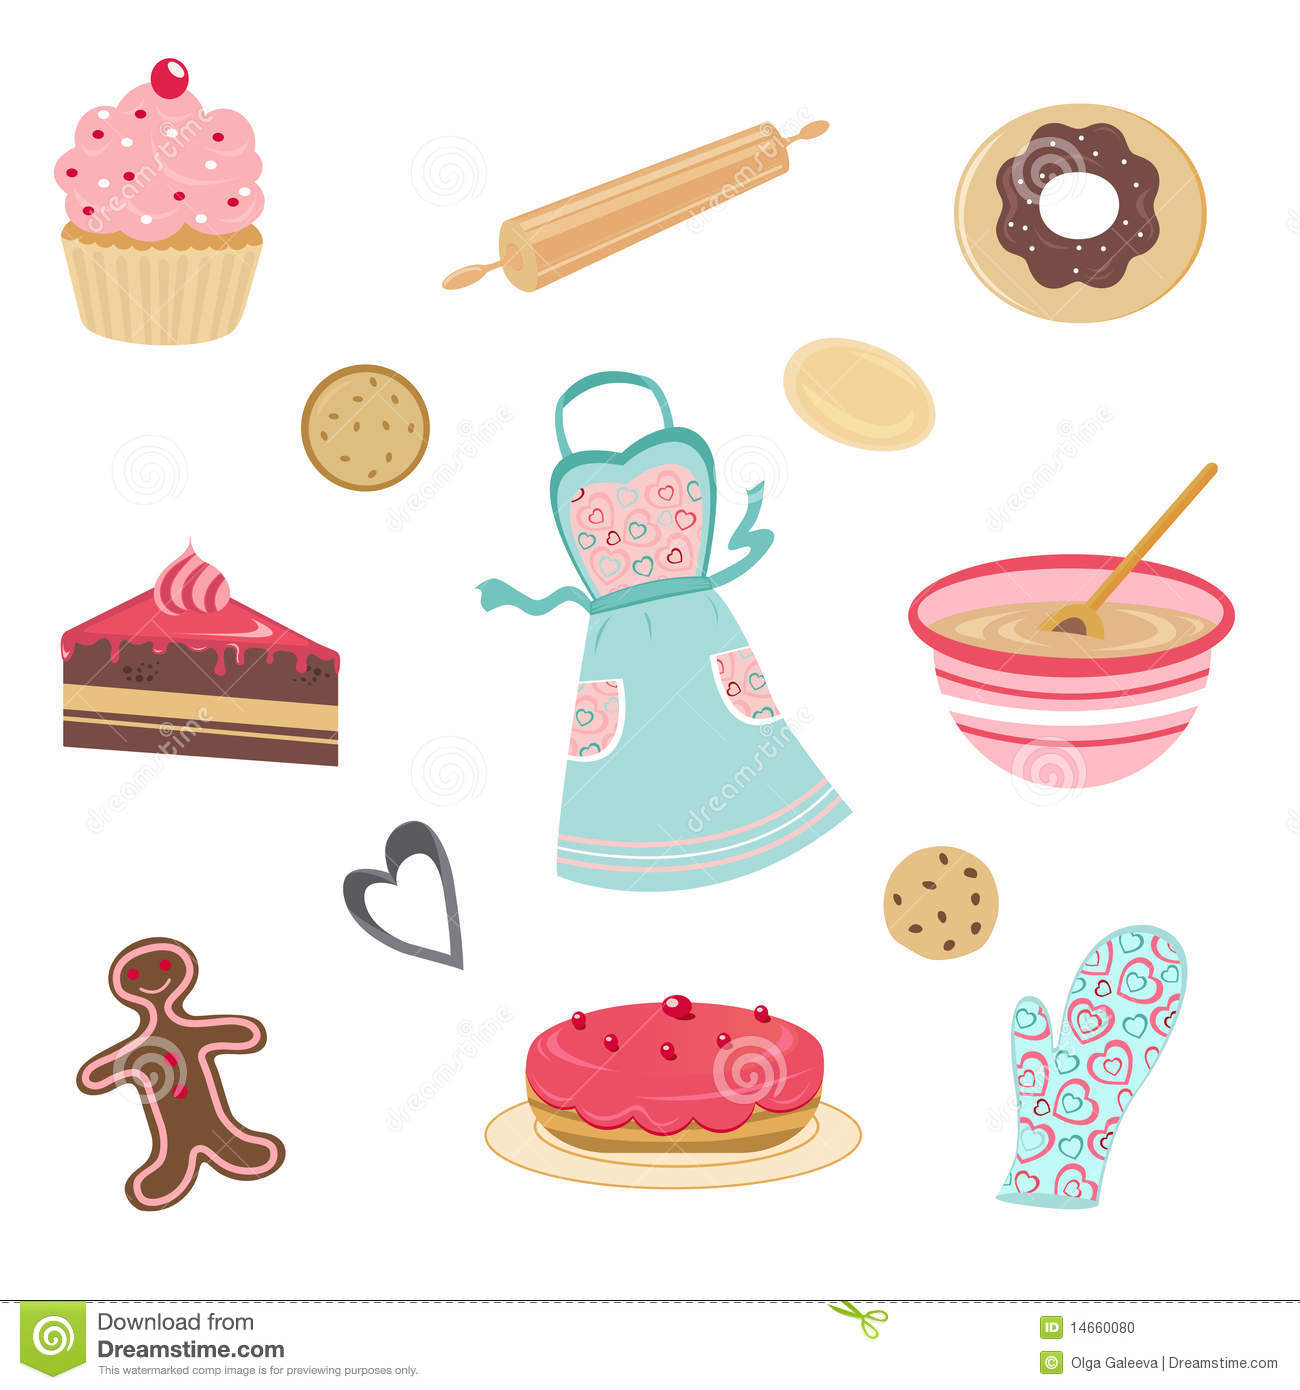 Cute Baked Goods Clipart.